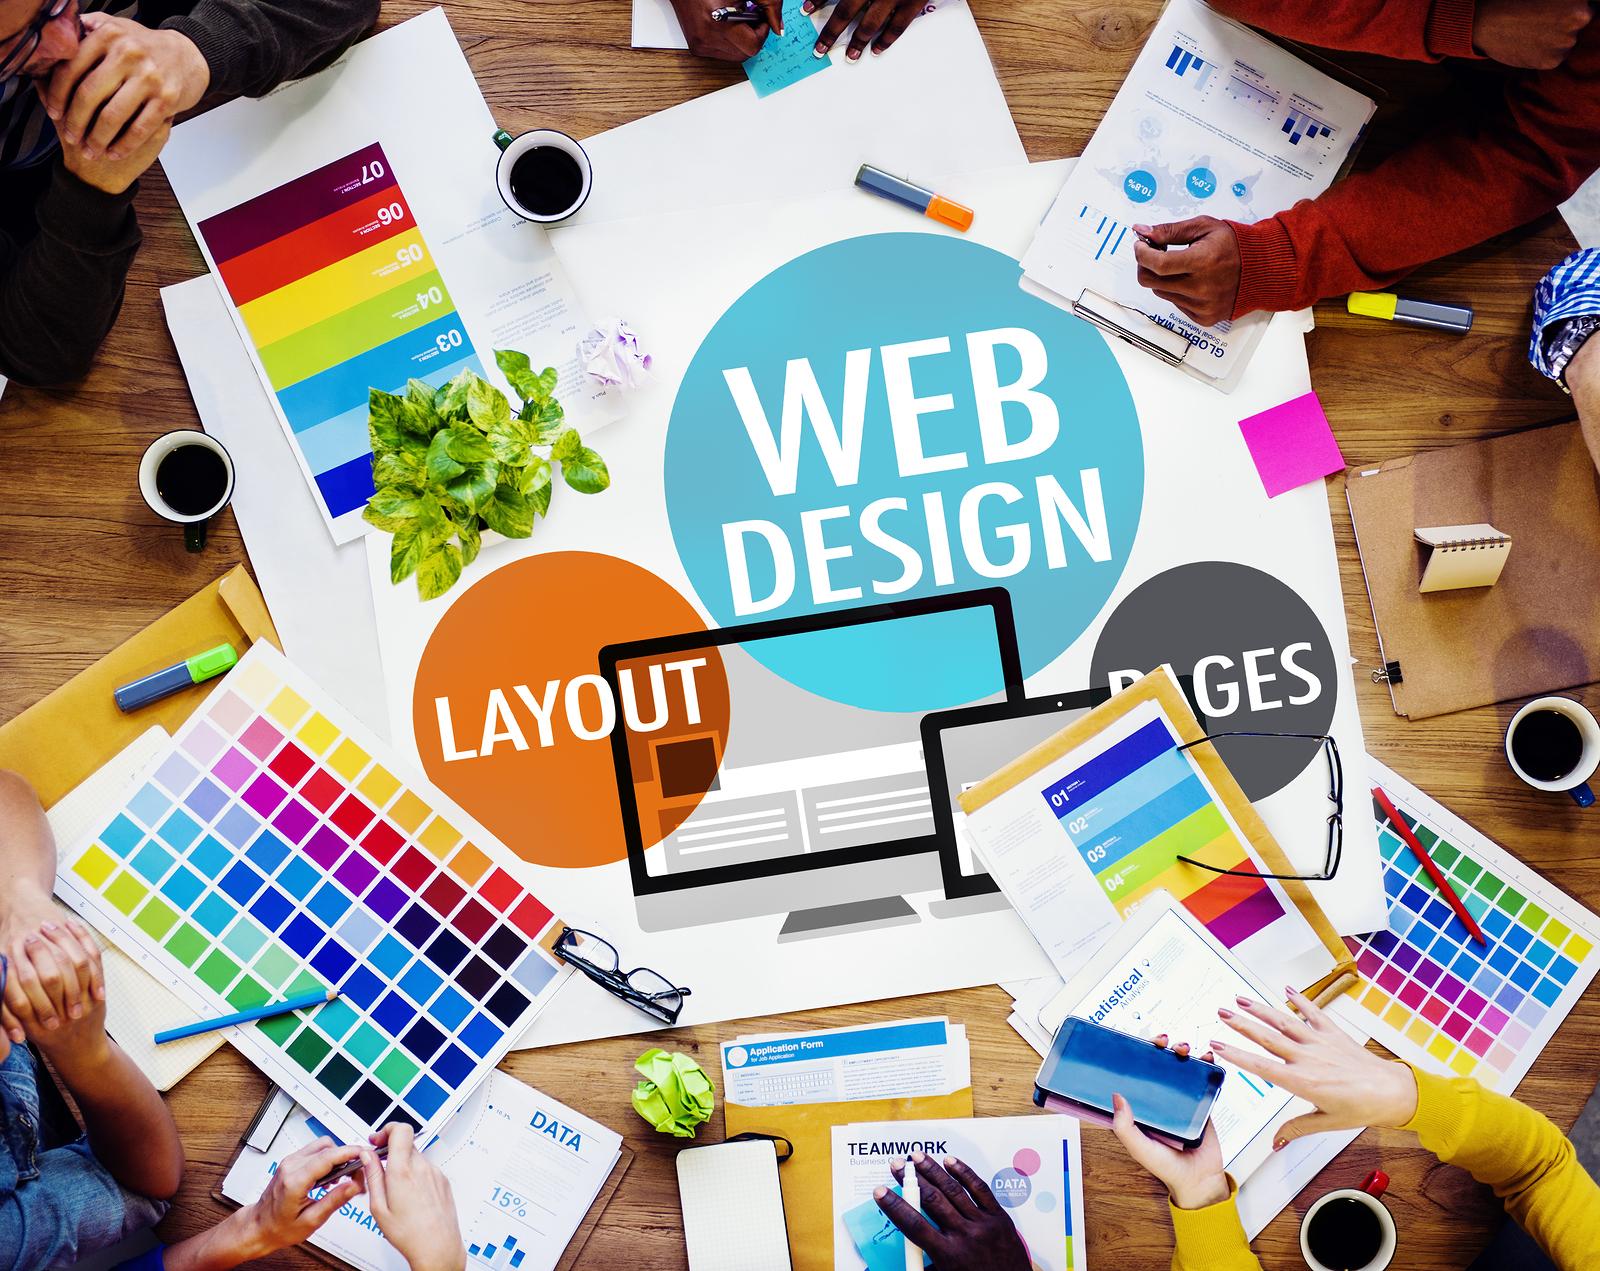 Free Web Design Is a Reality With WordPress.com WordPress.com